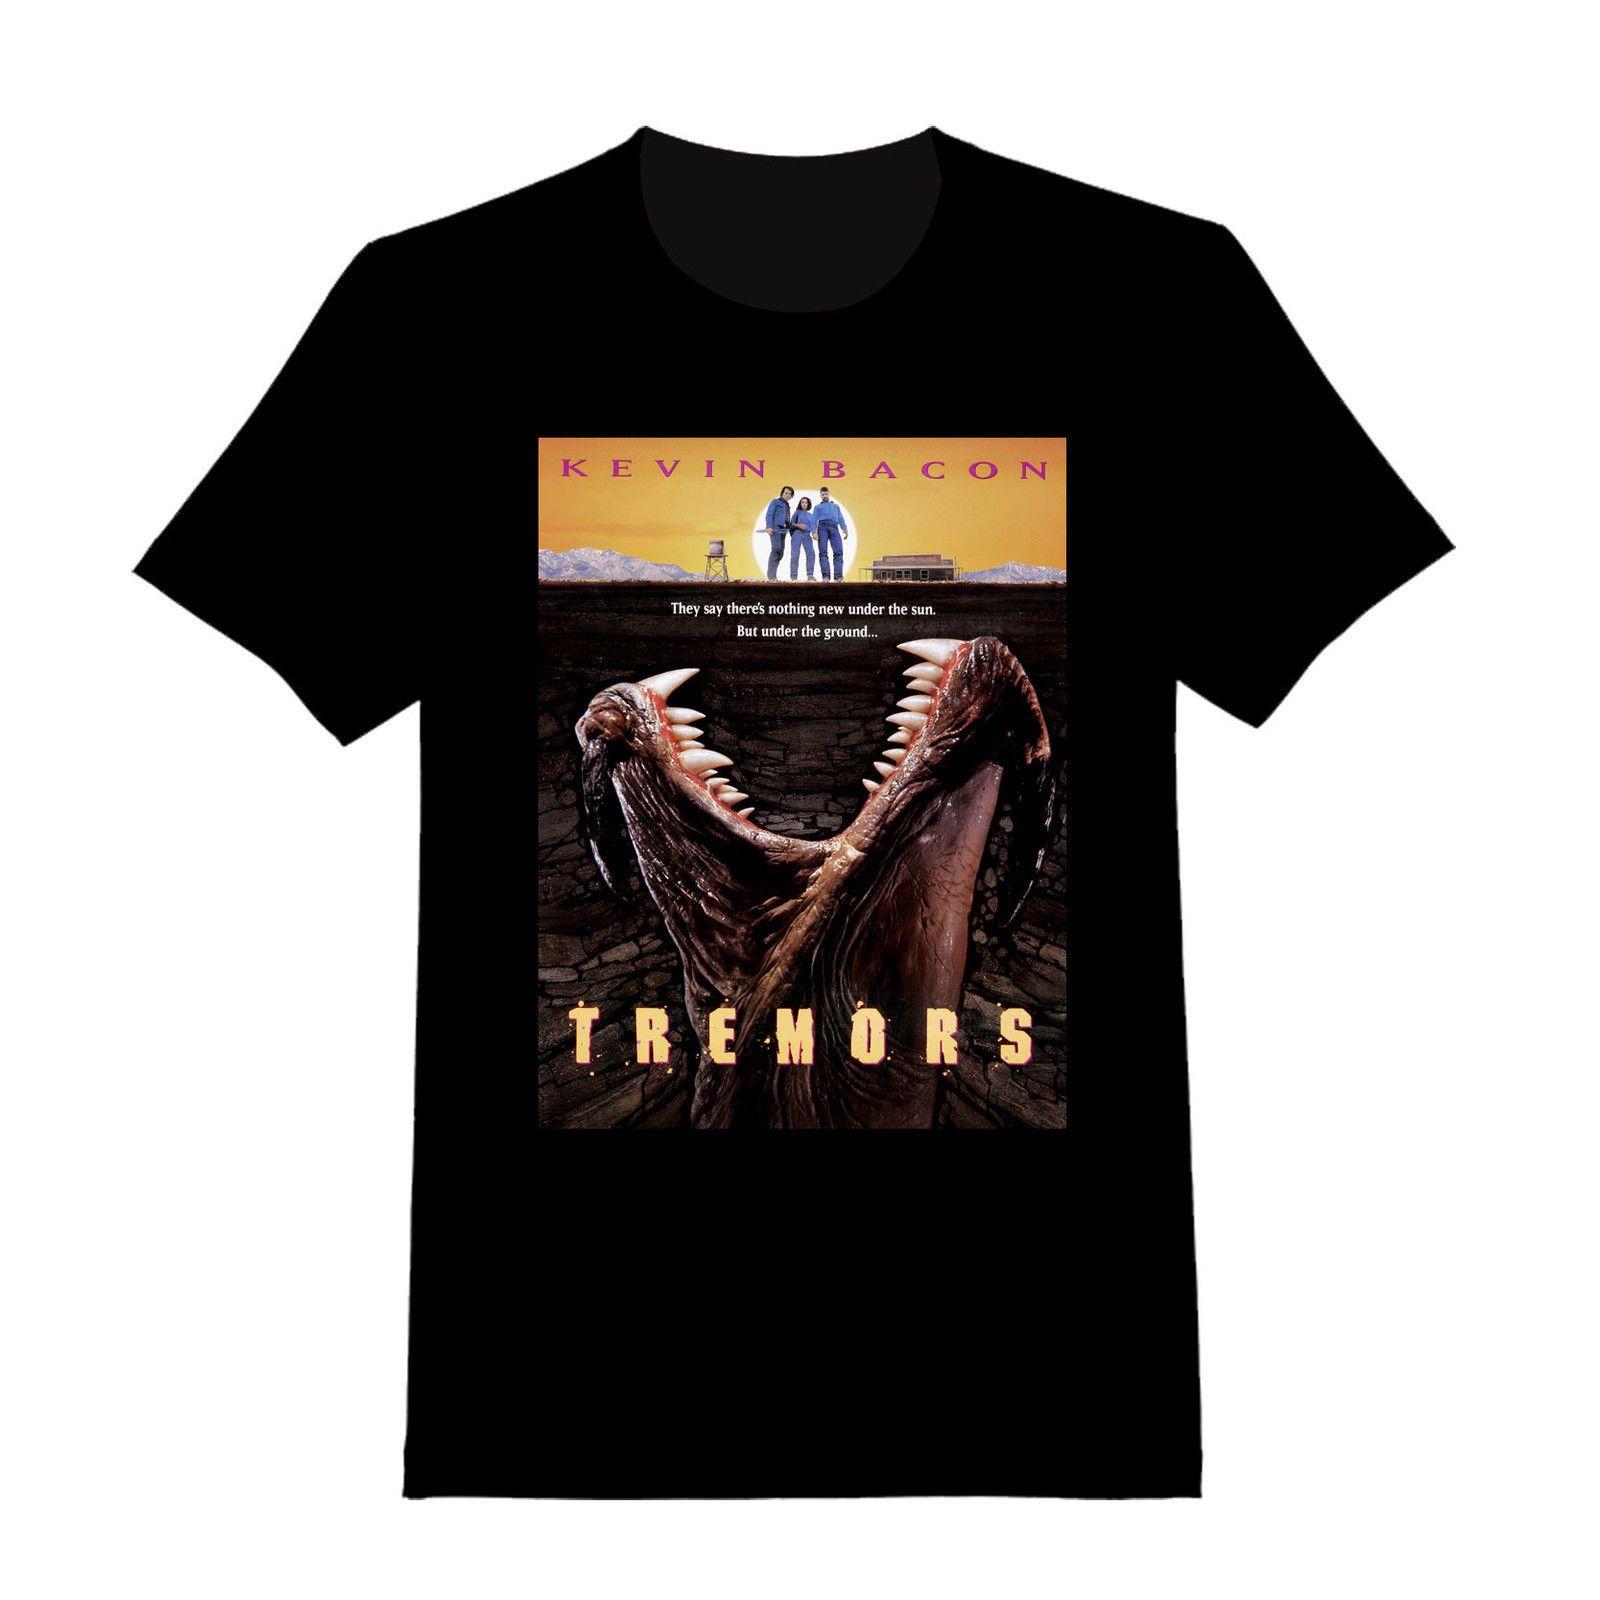 be8f5c497a5 Tremors Custom T Shirt 115 Custom Funny Maker Cool Design Your Own Shirt  100% Cotton Short Sleeve O Neck Tops Tee Shirts Offensive T Shirt T Shirt  Slogan ...